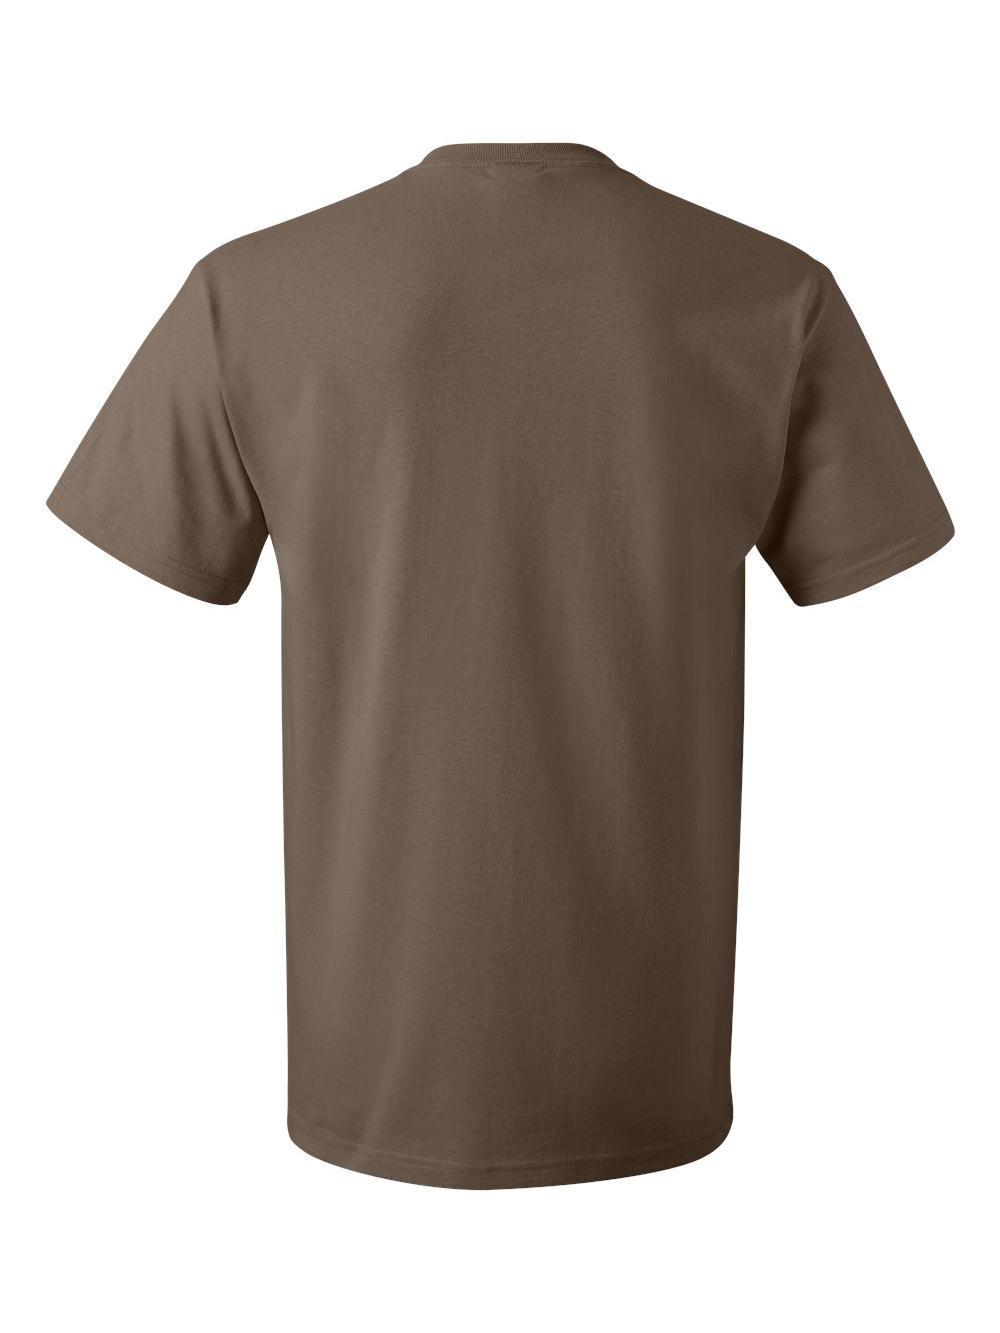 Fruit-of-the-Loom-HD-Cotton-Short-Sleeve-T-Shirt-3930R thumbnail 28